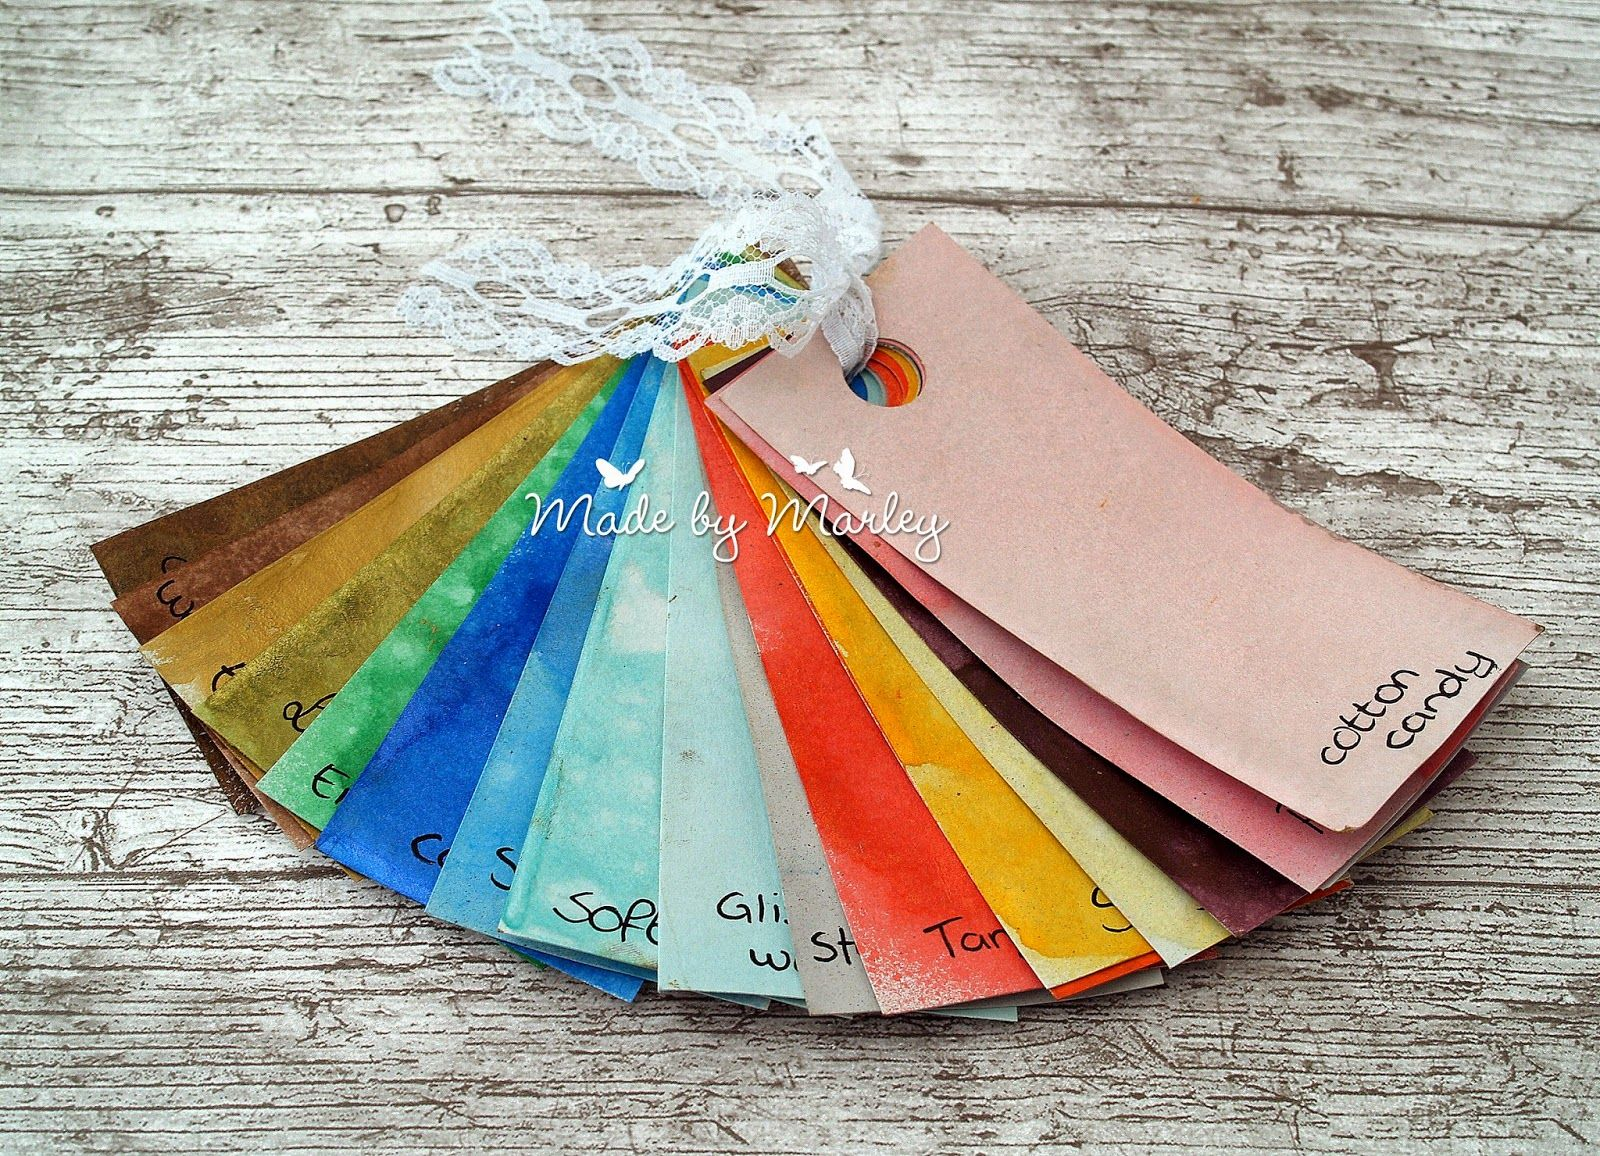 Scraps from Marley: Prima Marketing Color Bloom Sprays